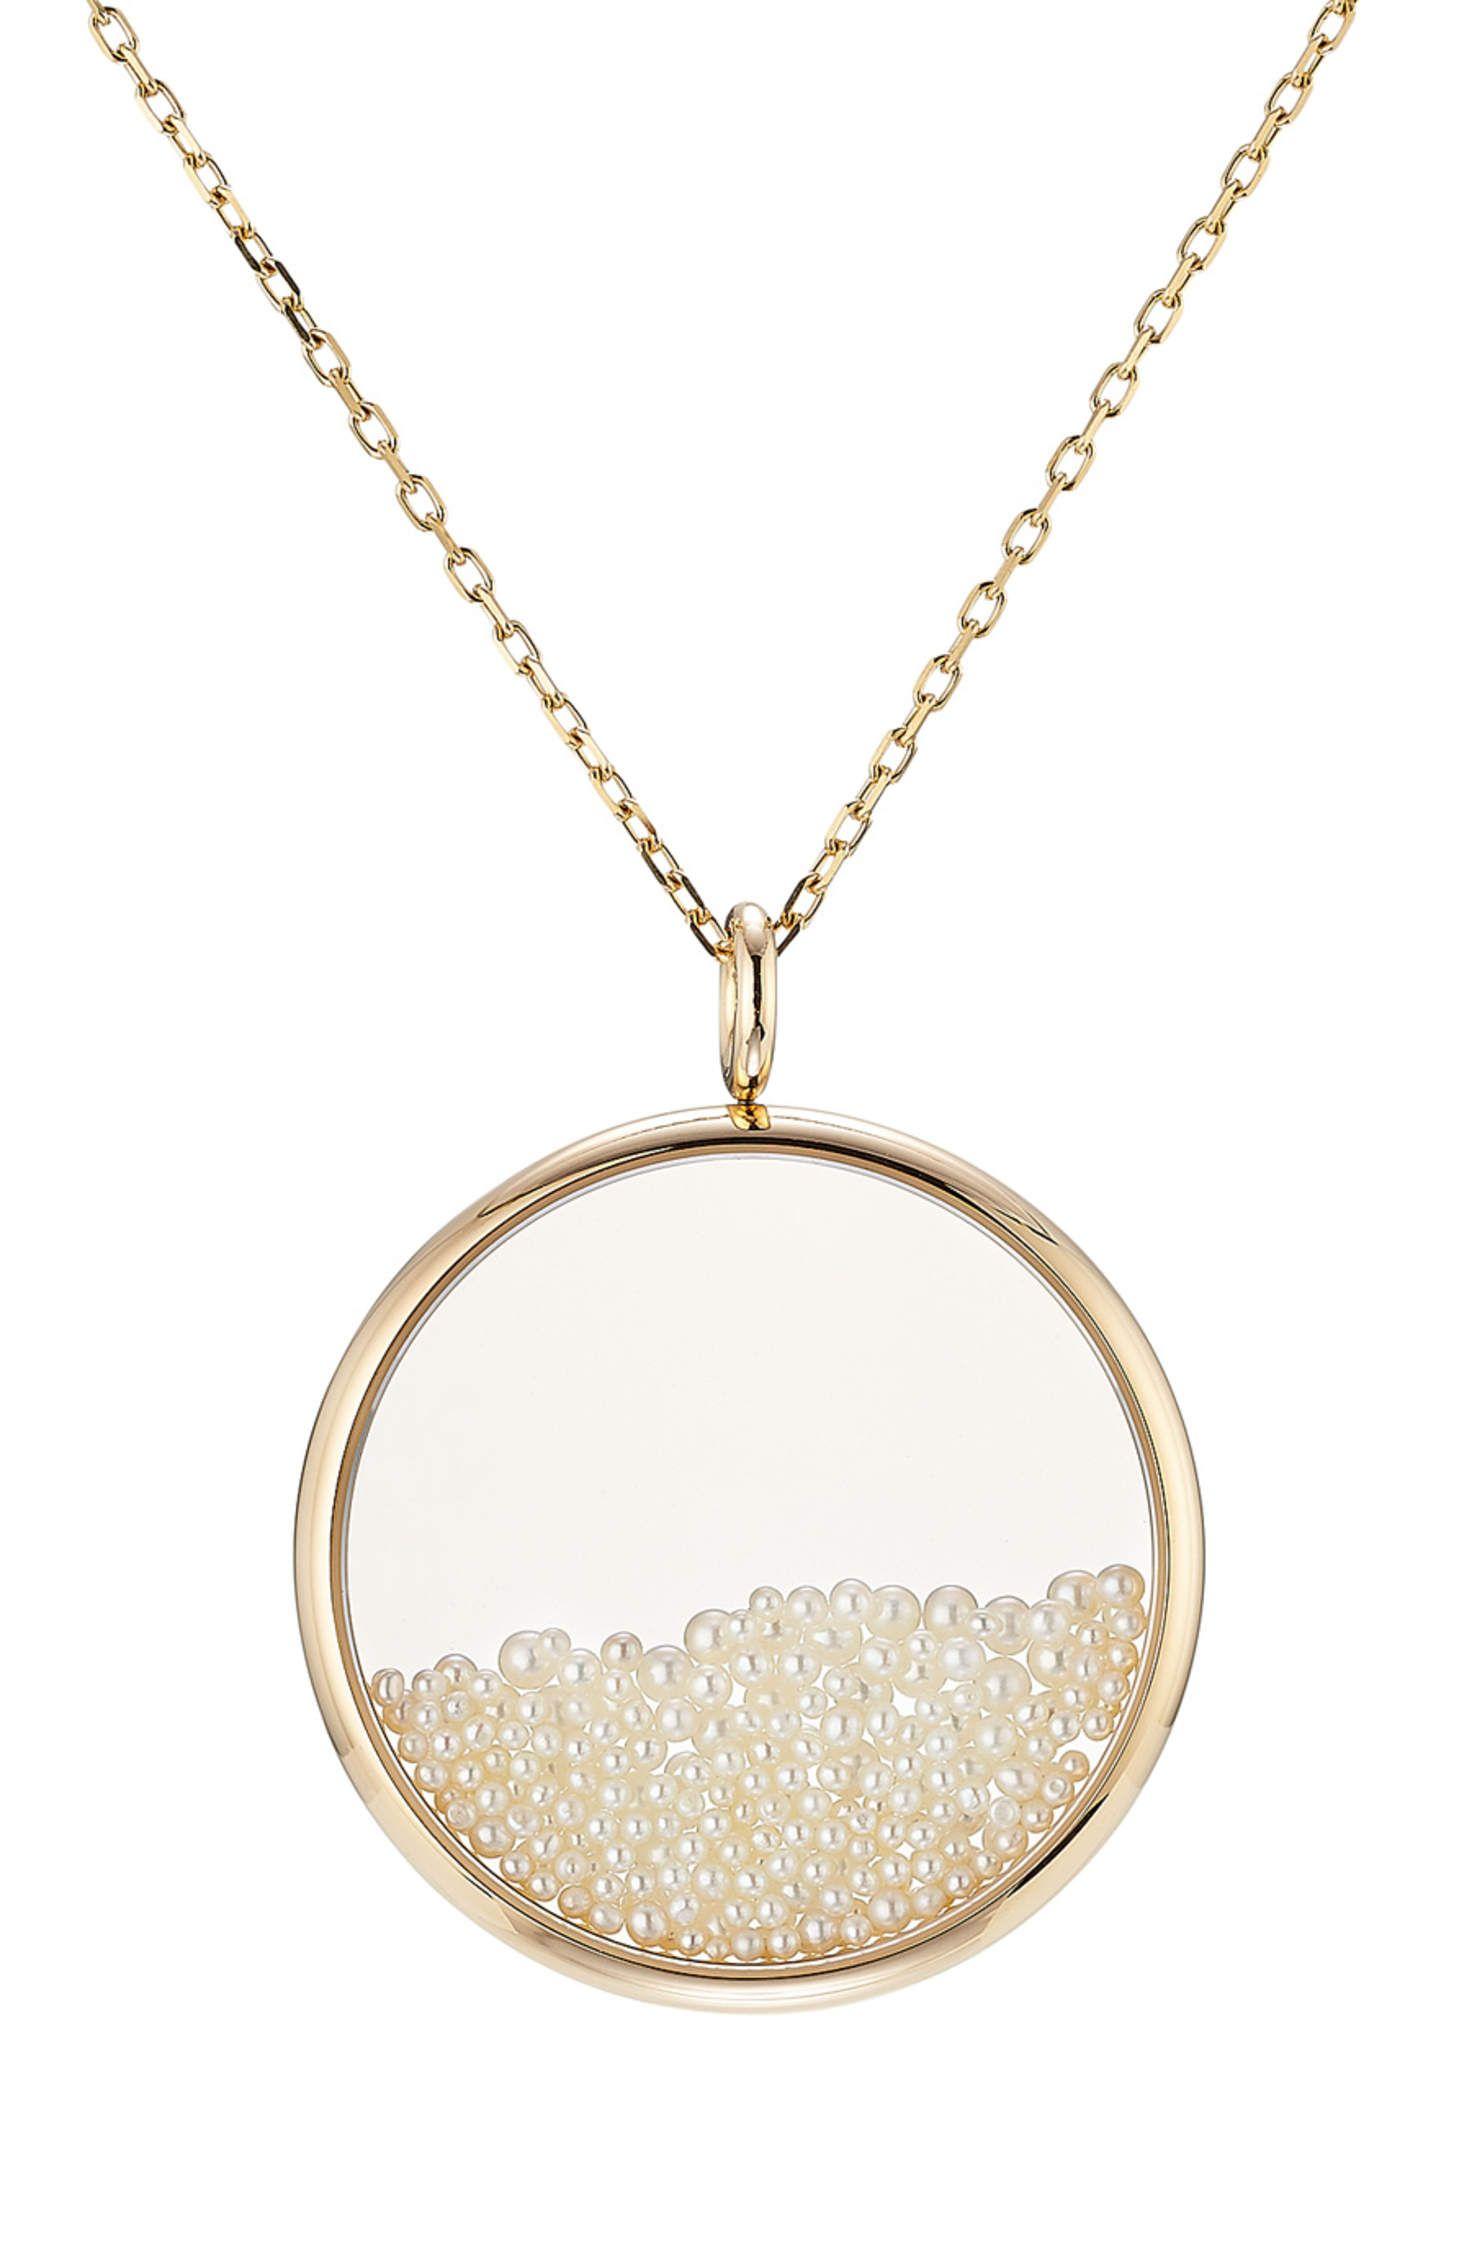 Aurélie Bidermann 18kt gold necklace KVs3jbfmu